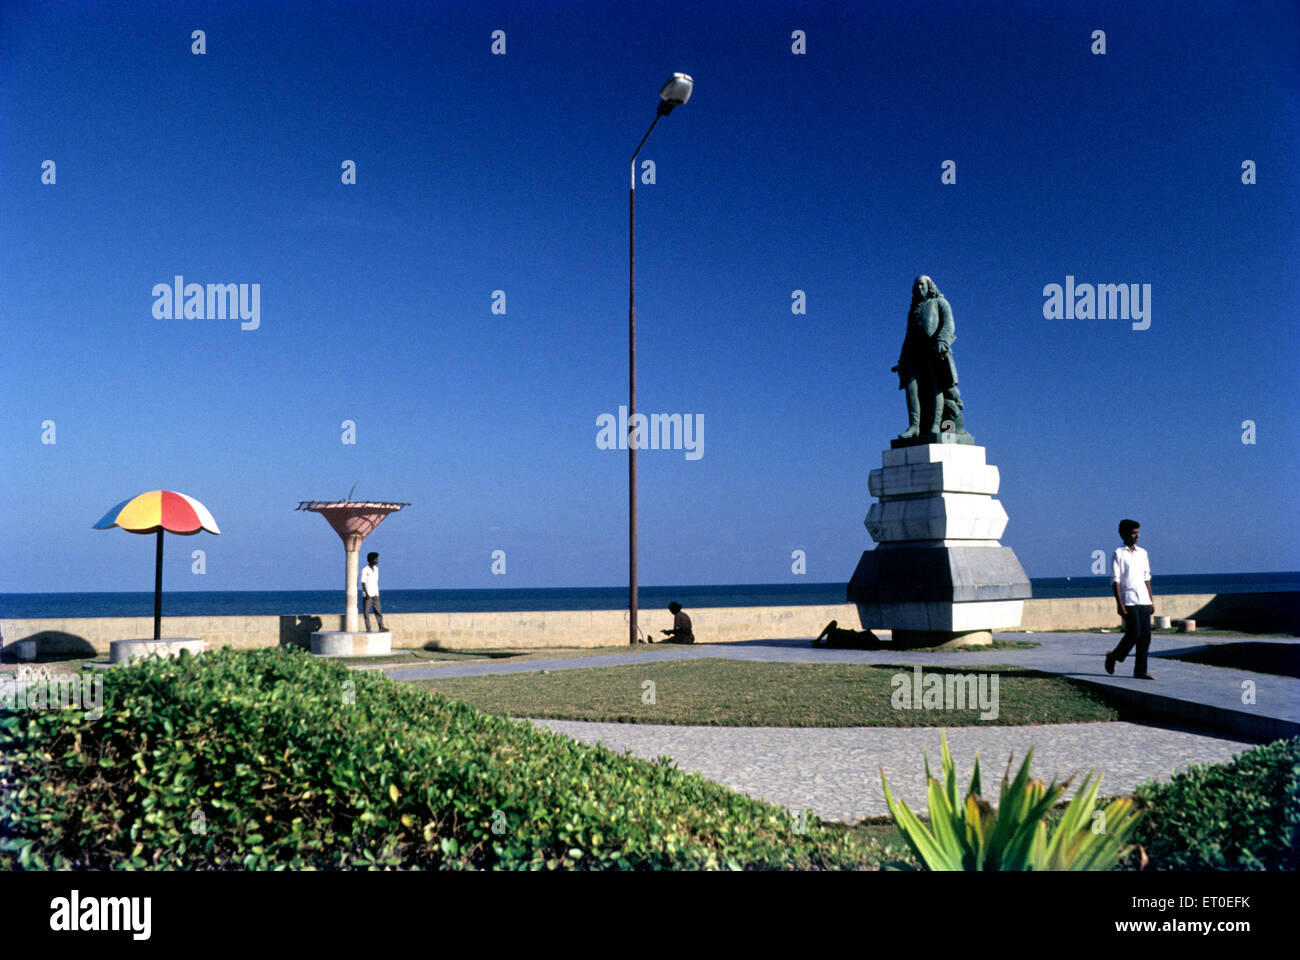 Joseph francois duplex statue ; Pondicherry ; Tamil Nadu ; India - Stock Image